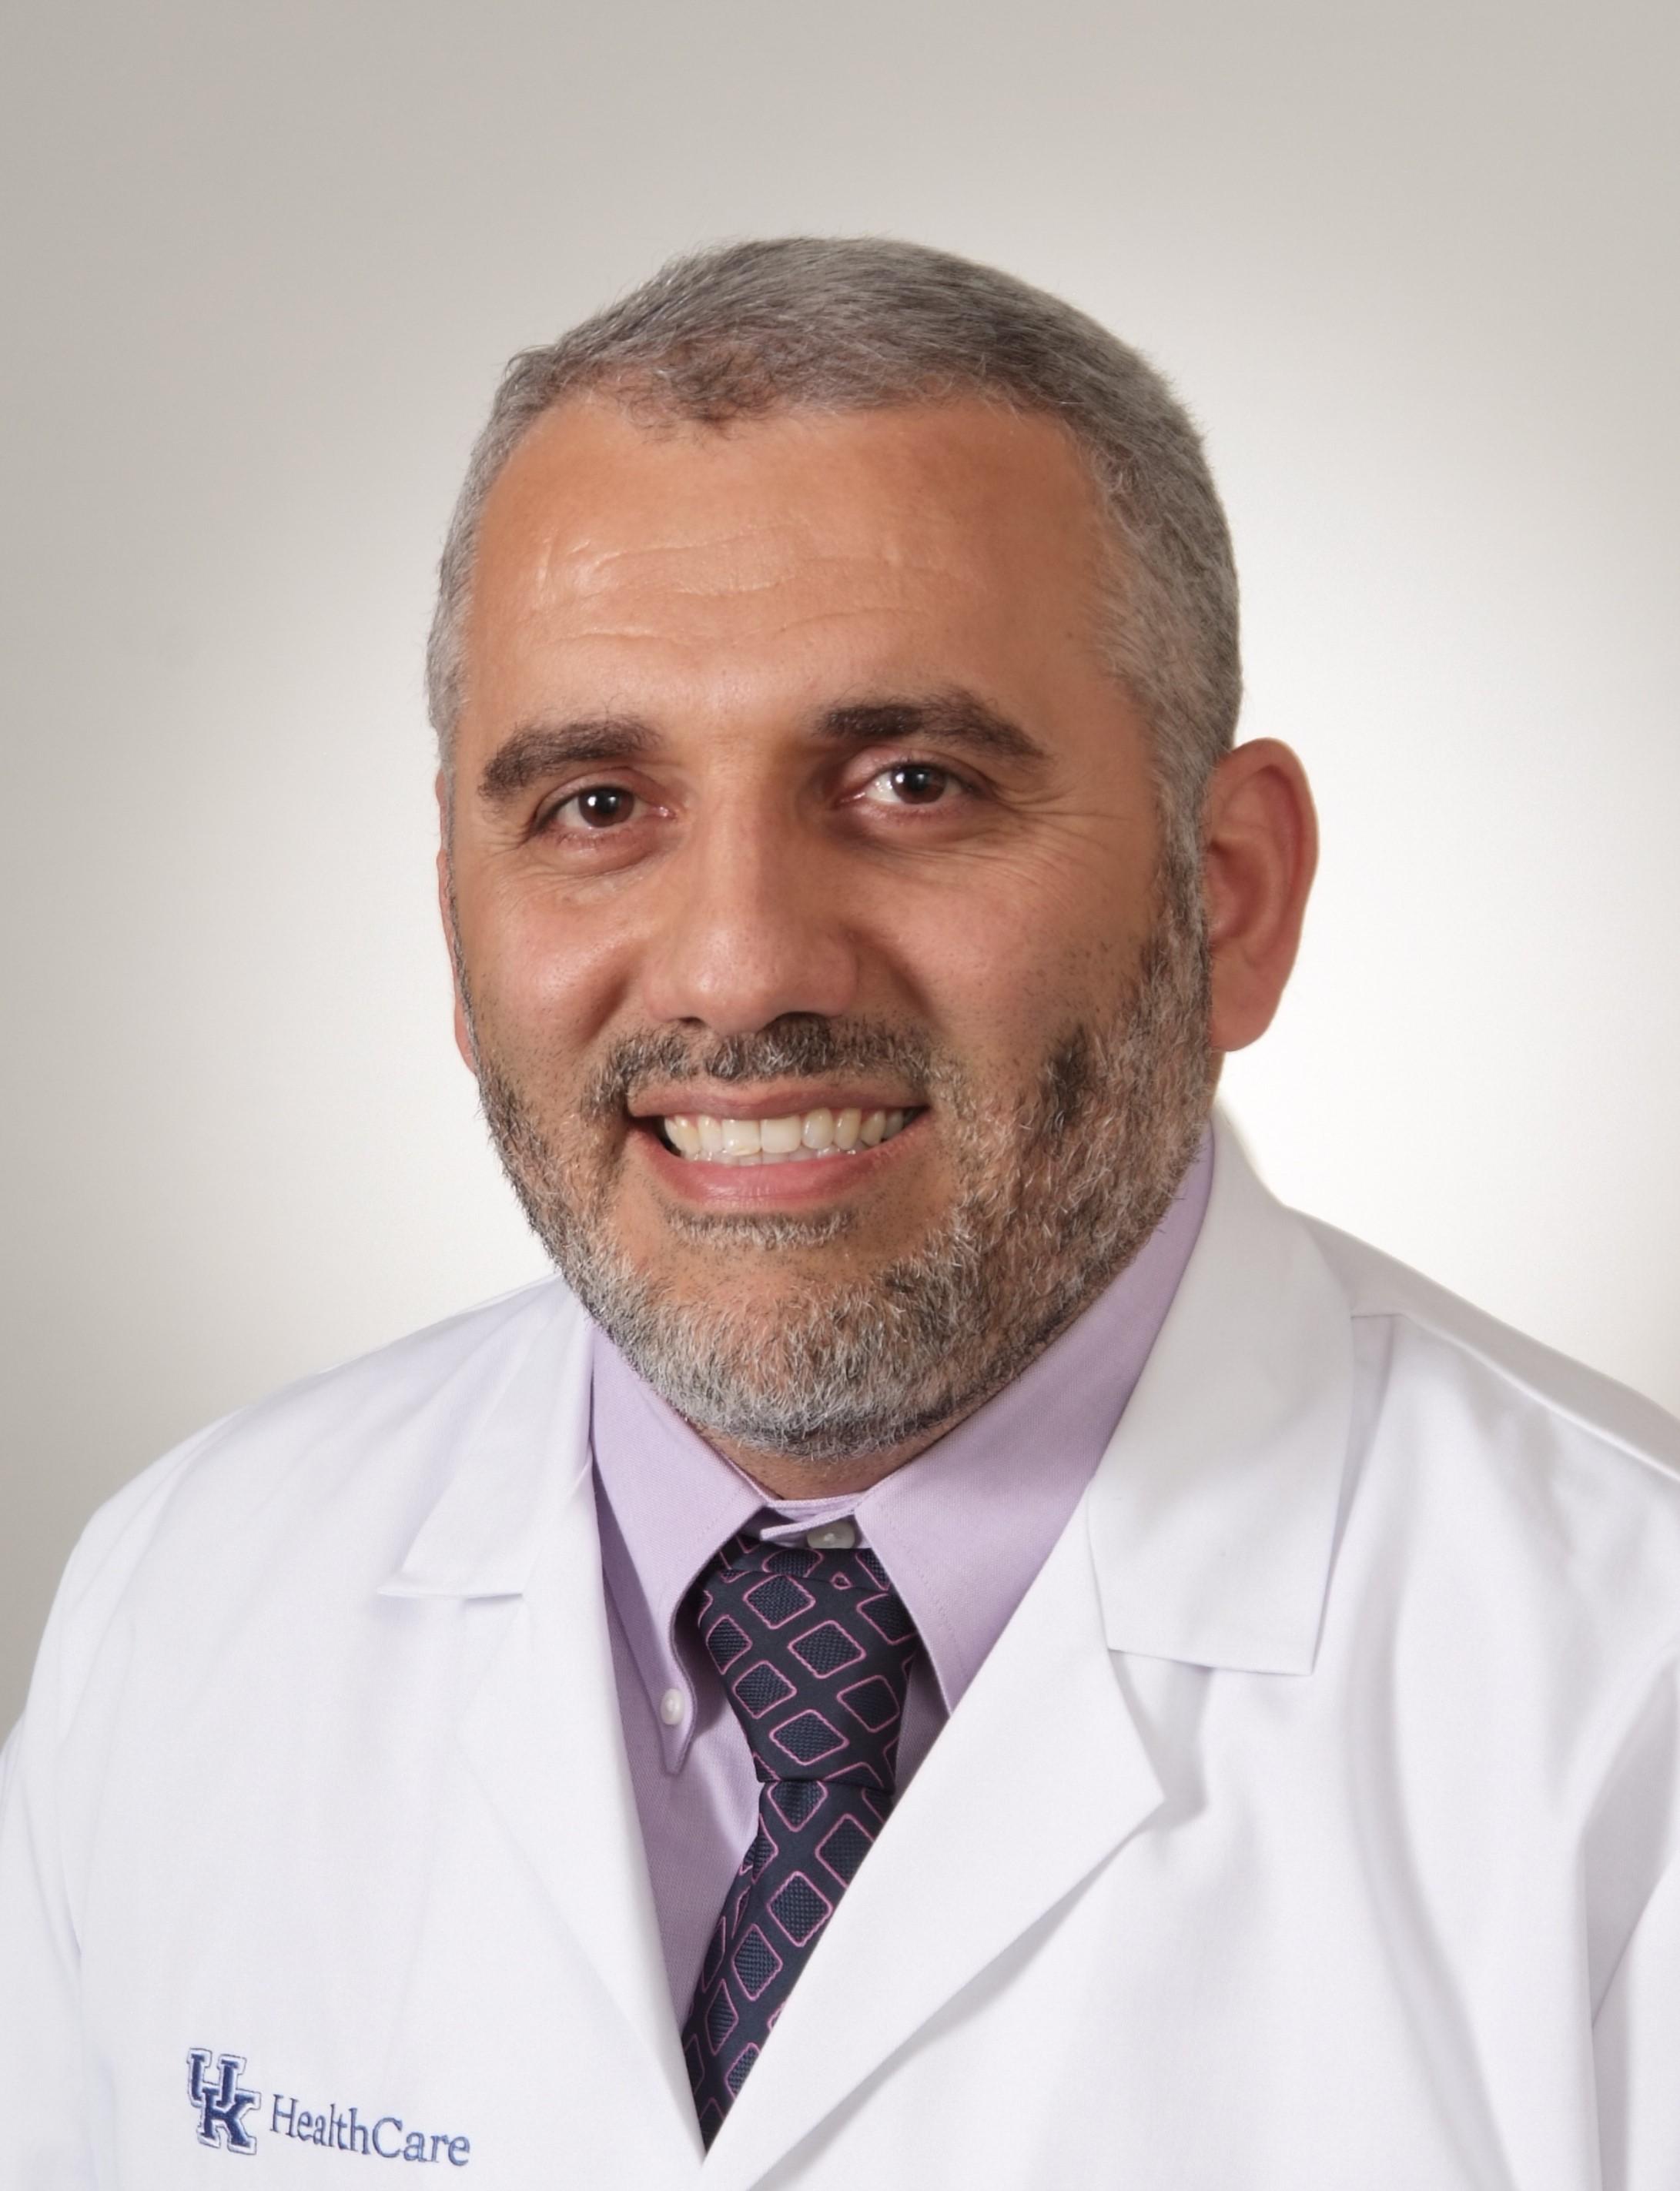 Shadi Qasem, M.D.